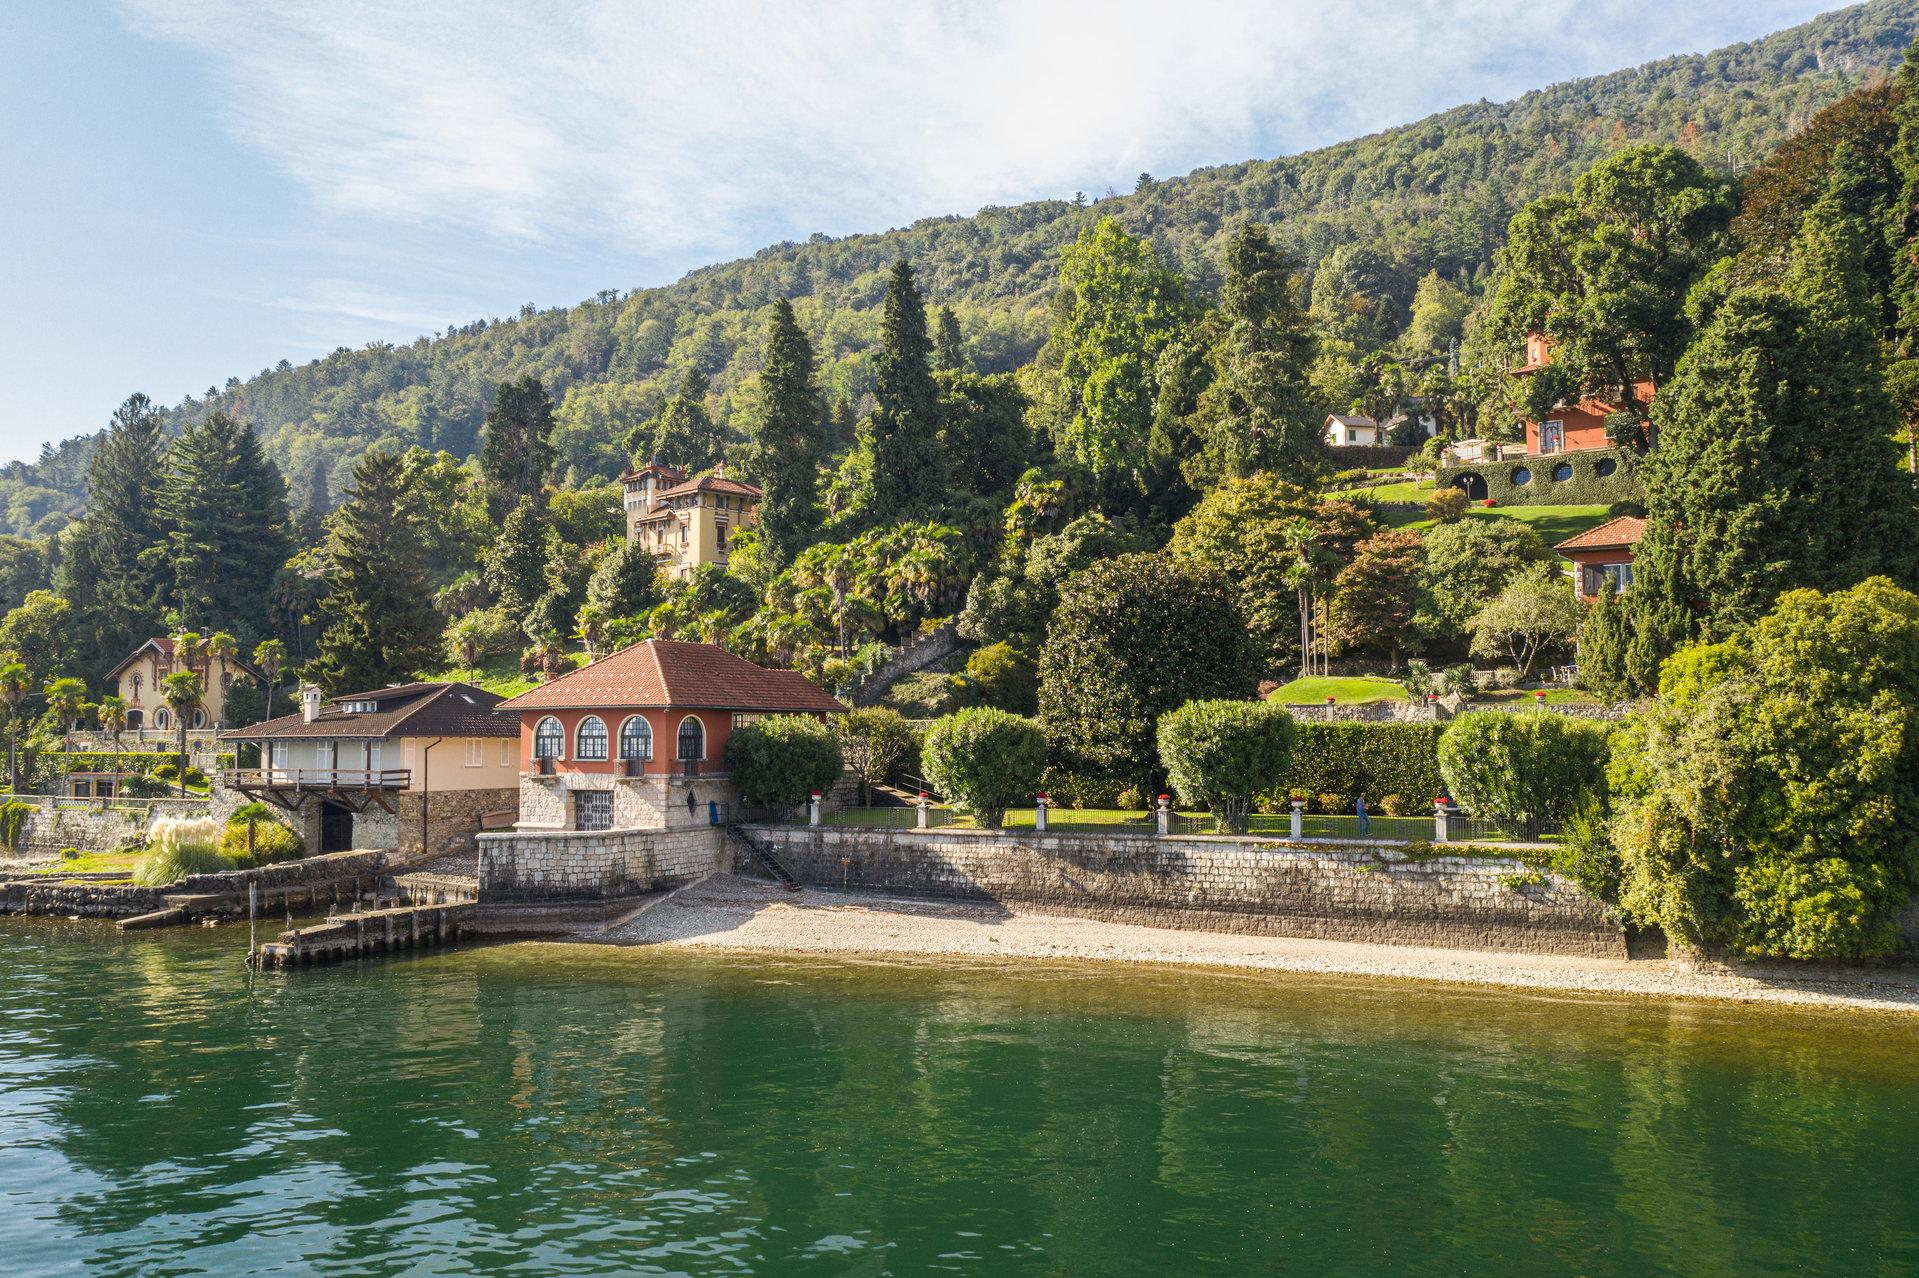 Villa d'epoca pieds dans l'eau in vendita a Ghiffa - posizione